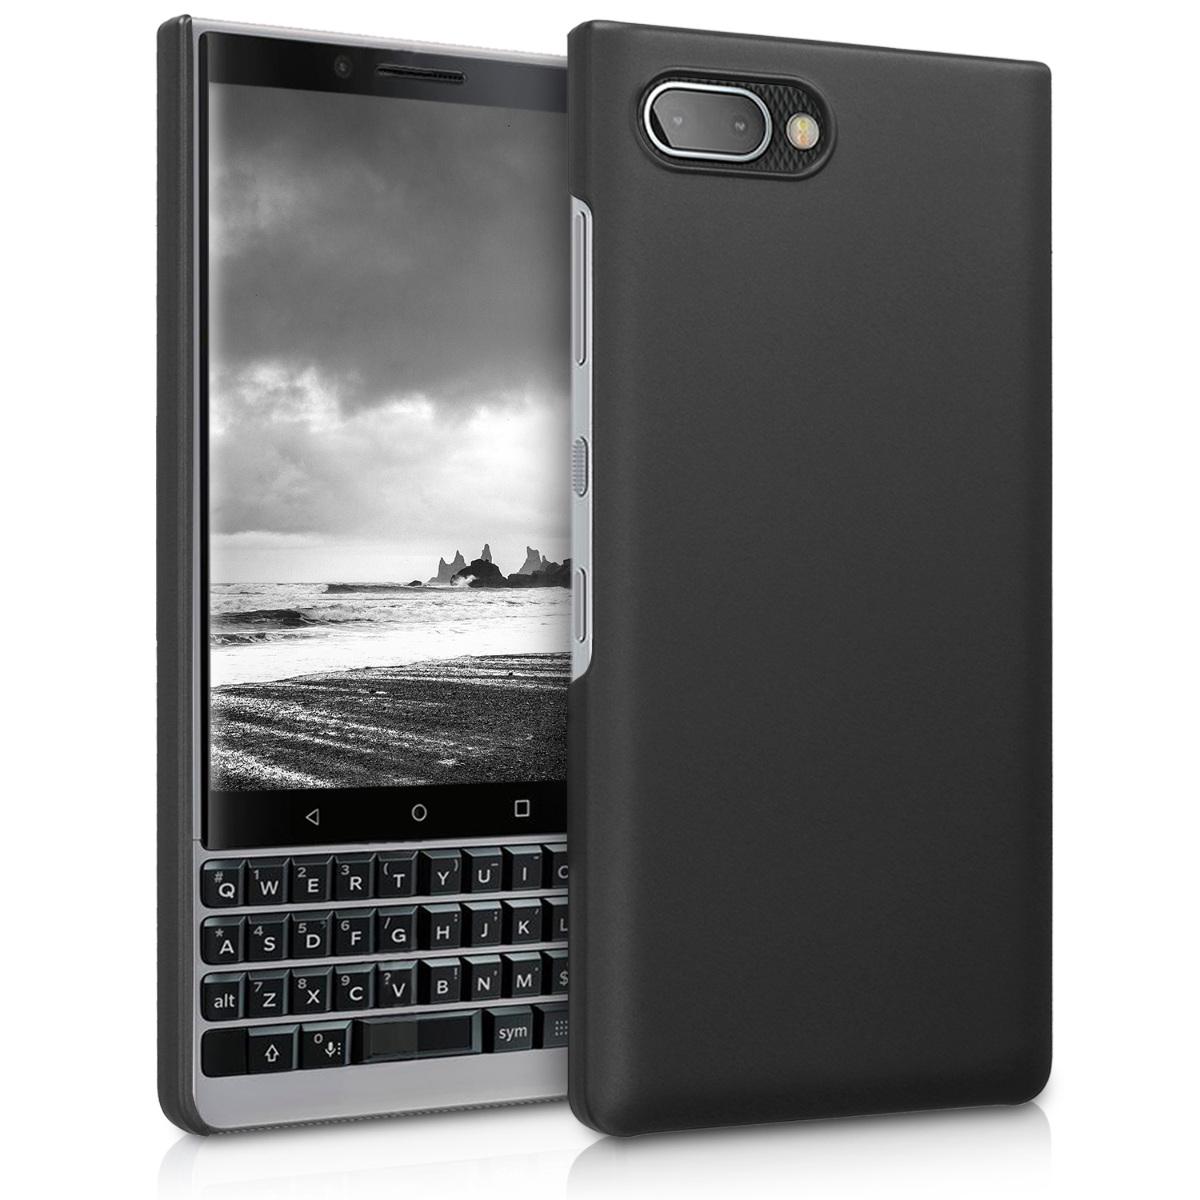 KW Slim Anti-Slip Cover - Σκληρή Θήκη Καουτσούκ BlackBerry KEY2 - Μαύρο μεταλλικό (46063.68)